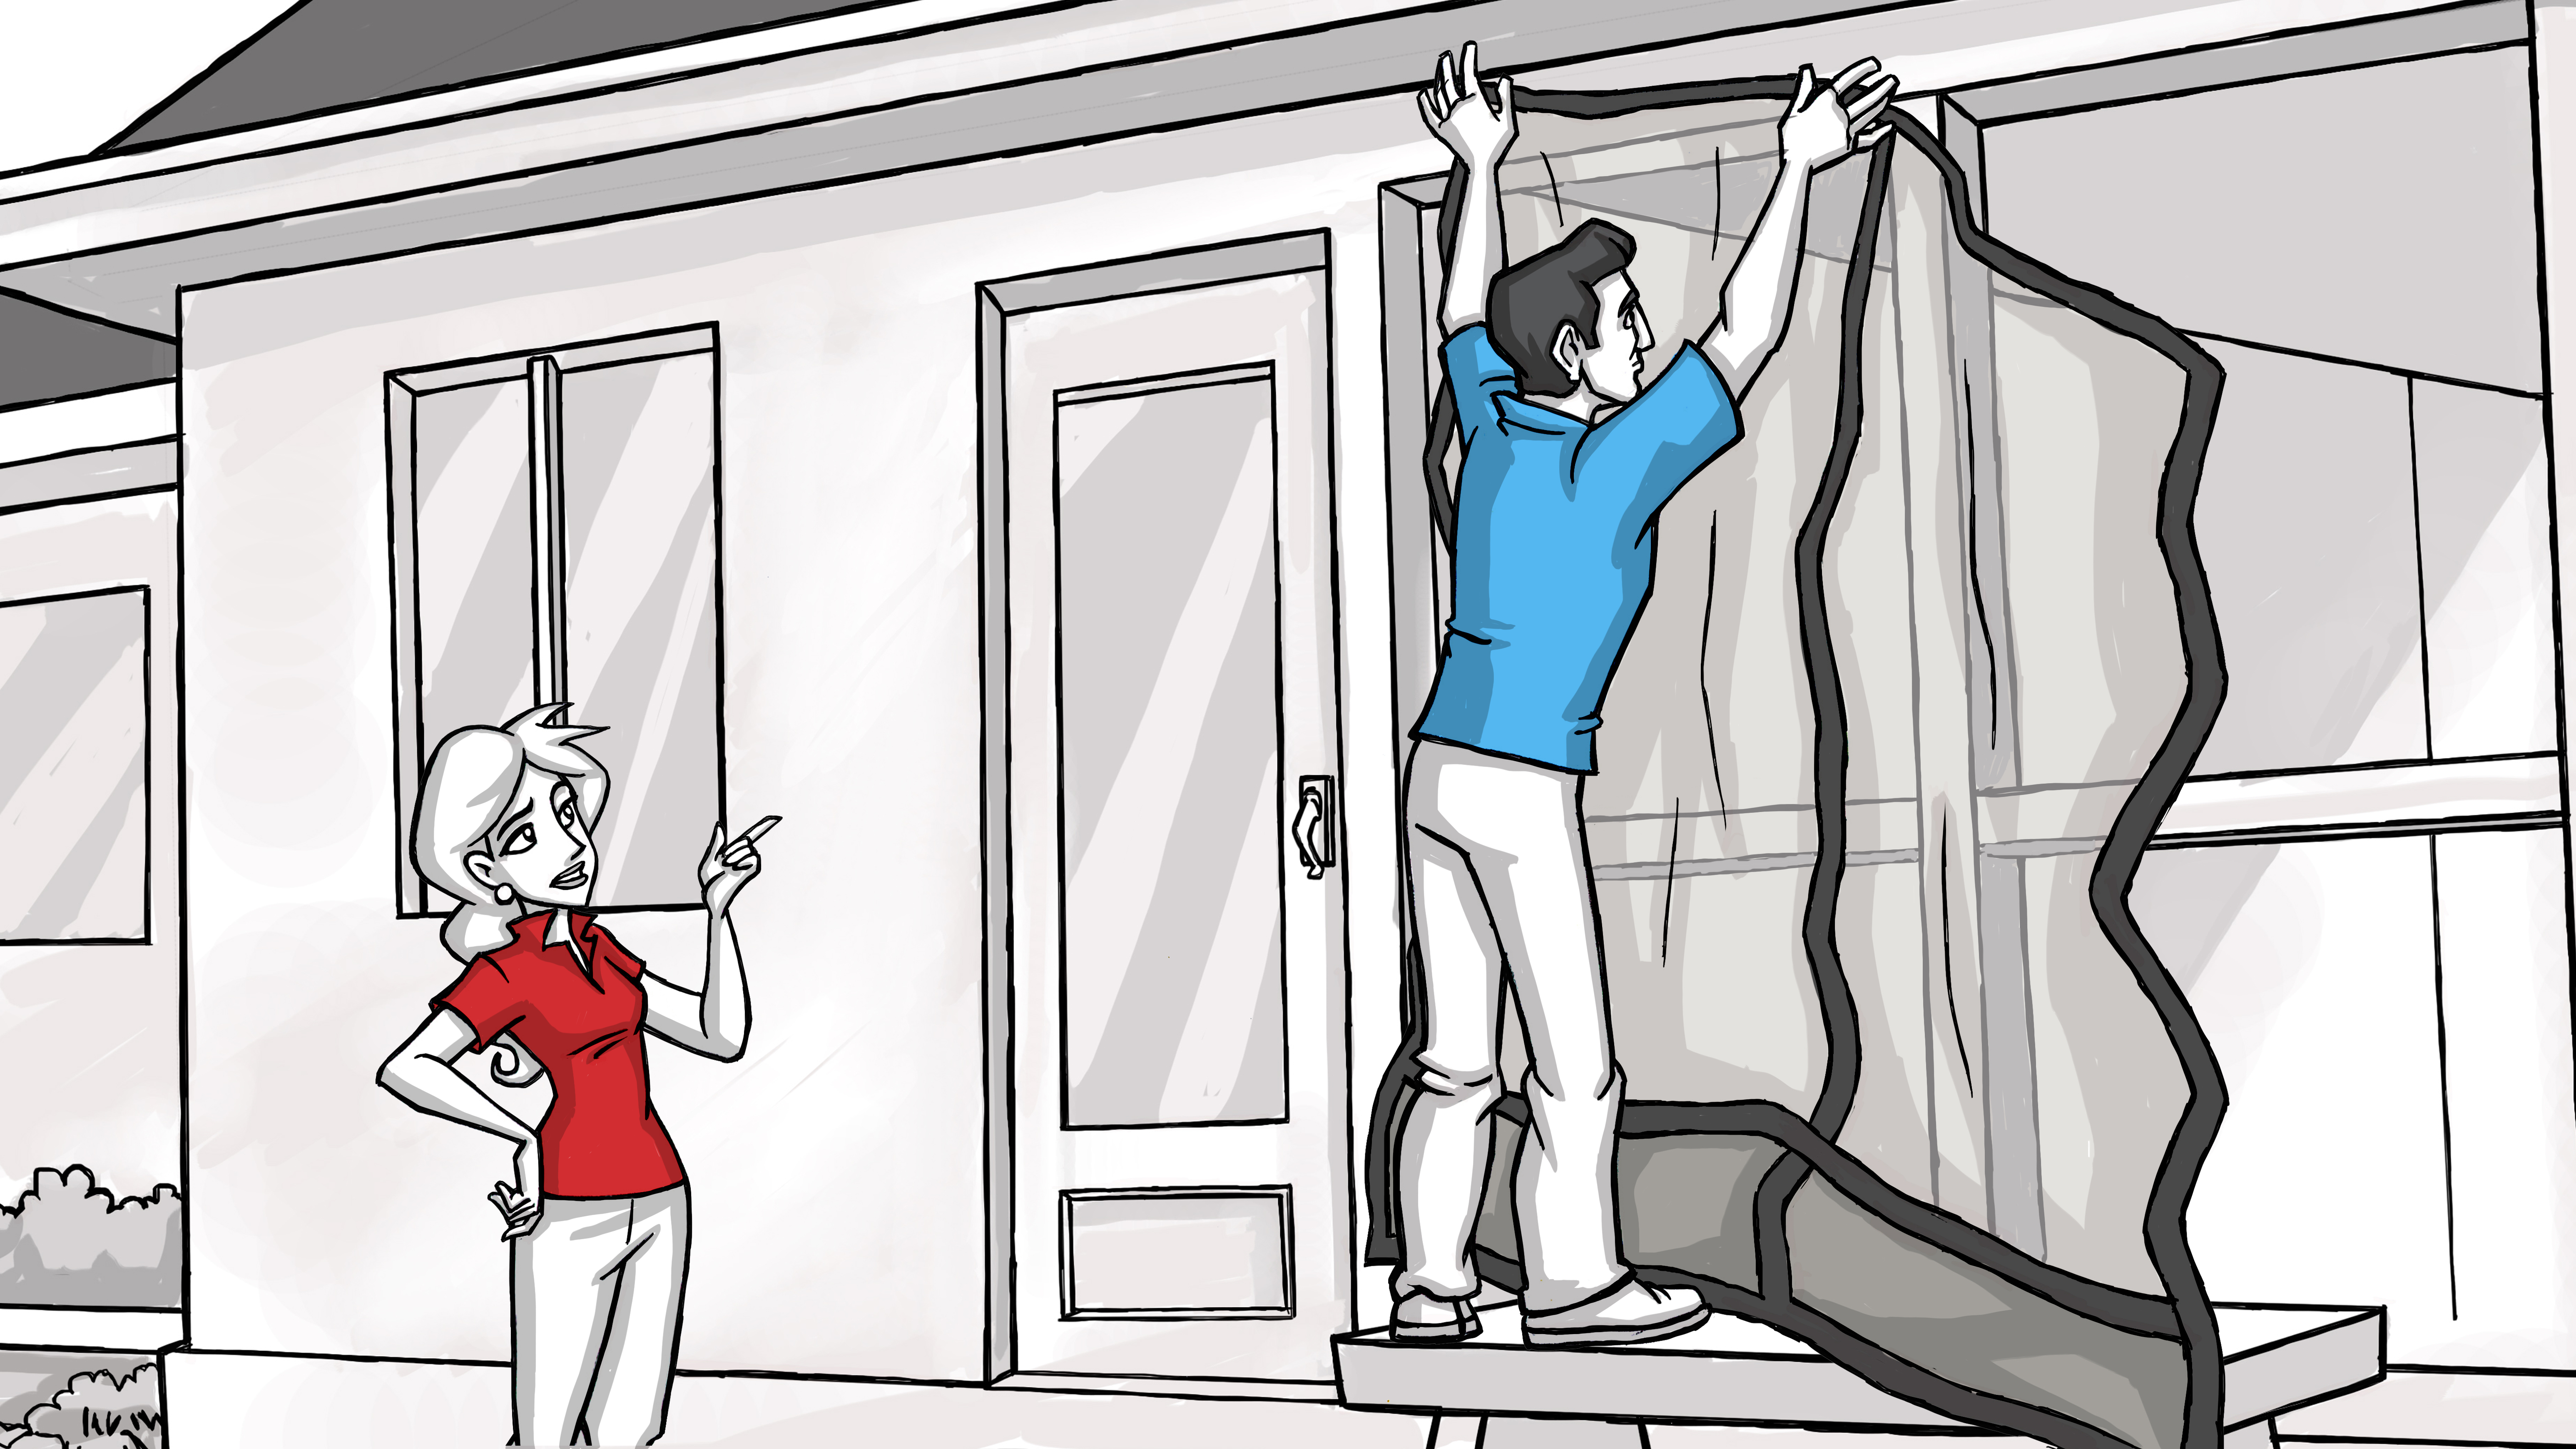 Mosquito Curtains 2 - Scene 04b